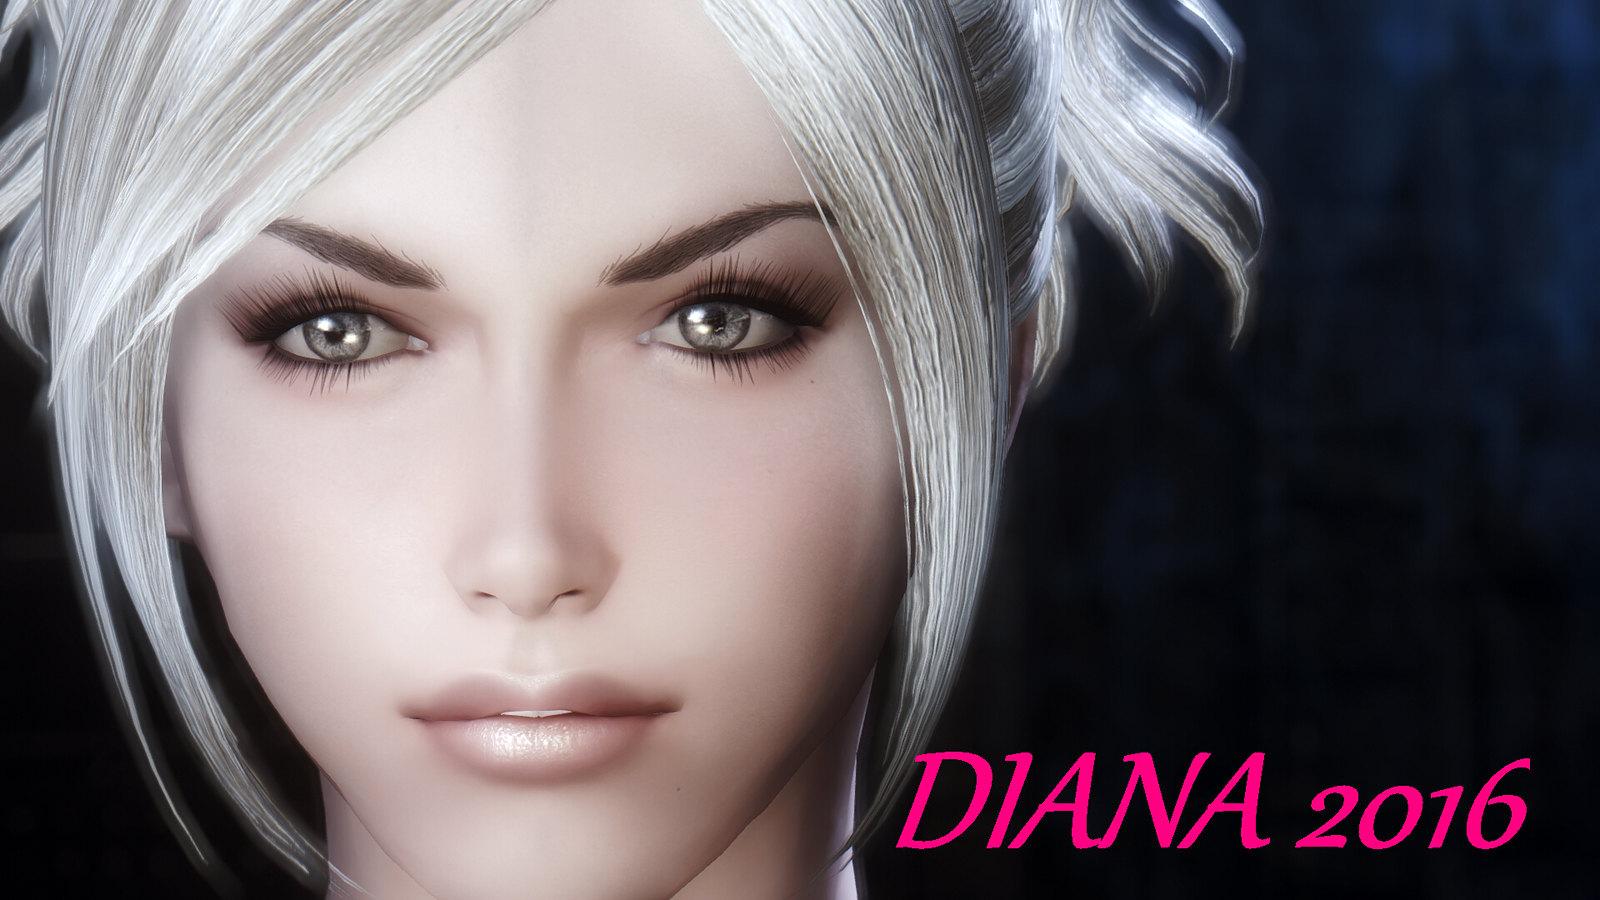 Diana Ece And Racemenu Preset At Skyrim Nexus Mods And Community